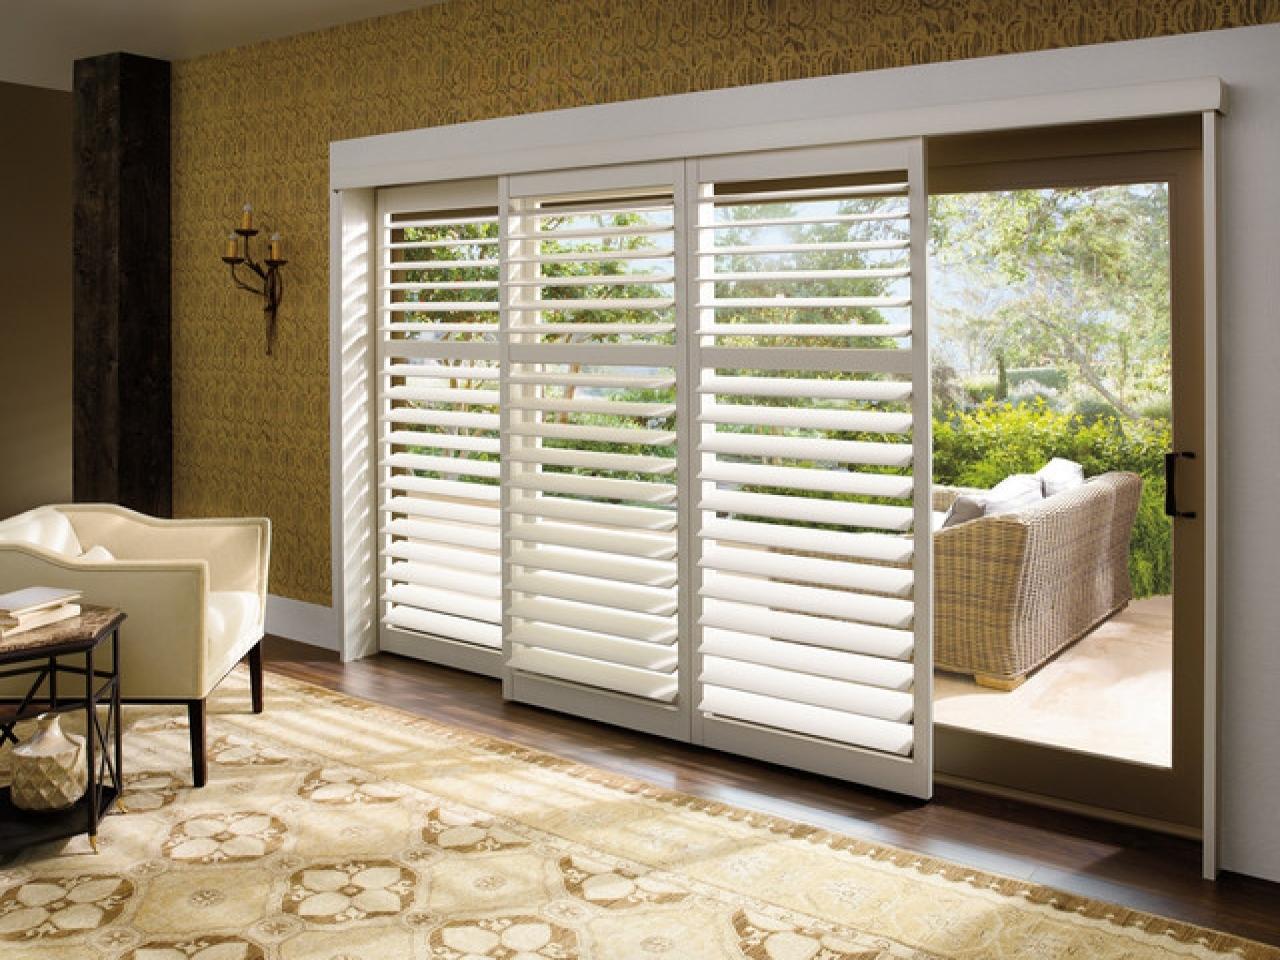 Blind Options For Sliding Glass Doorswindow treatments for sliding glass doors ideas tips